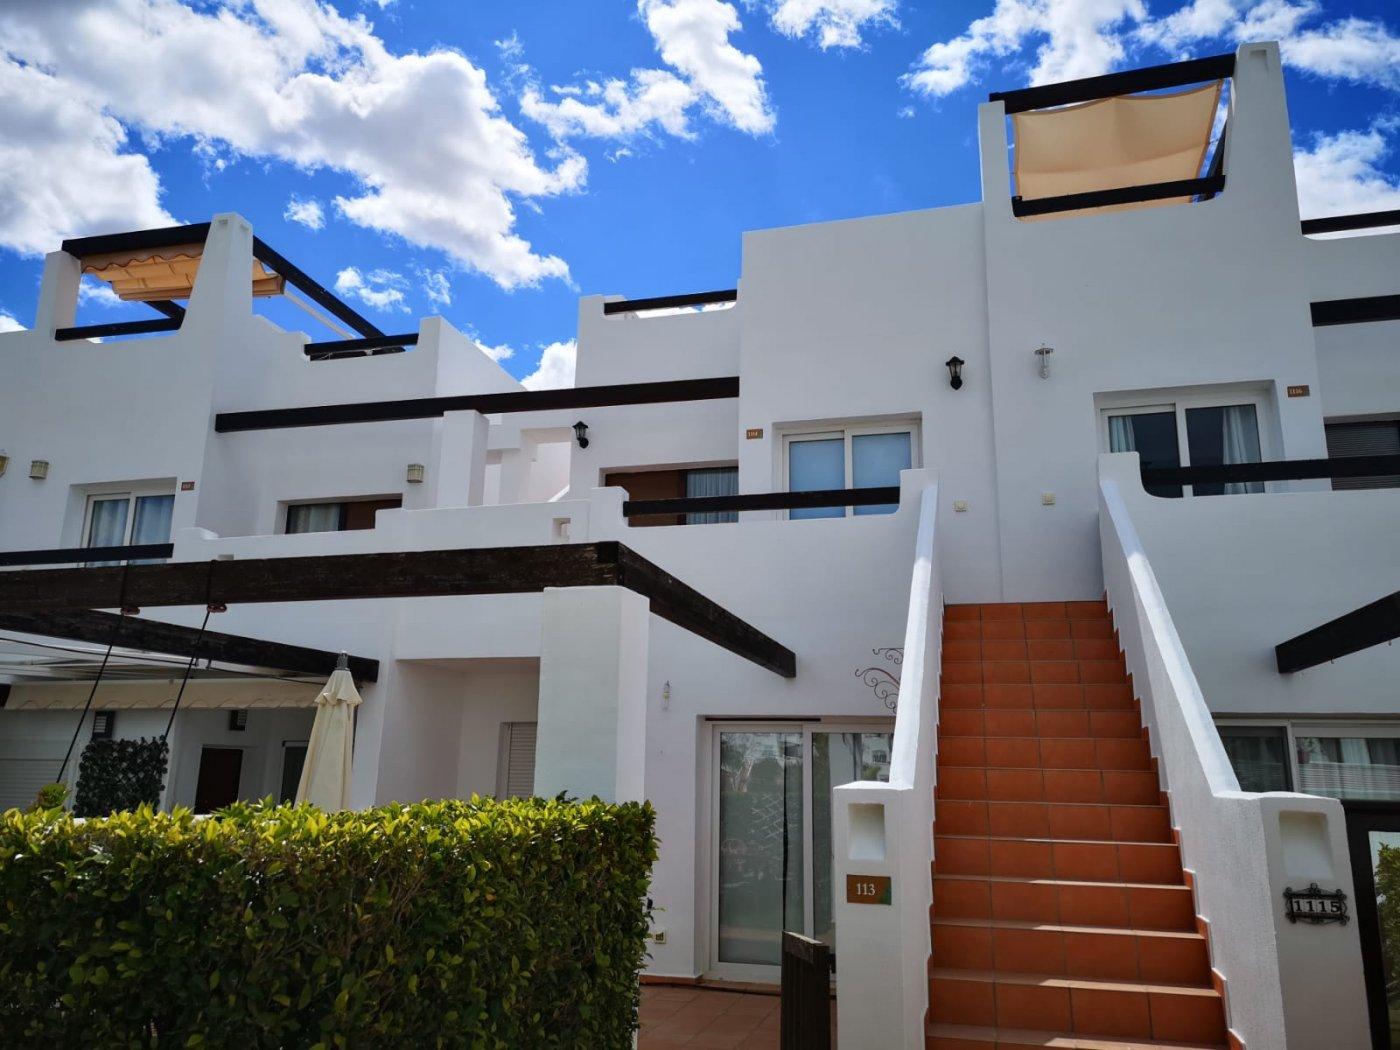 Gallery Image 1 of Key-Ready 2 Bedroom Apartment Overlooking the Citrus Groves in Jardin 10, Condado de Alhama